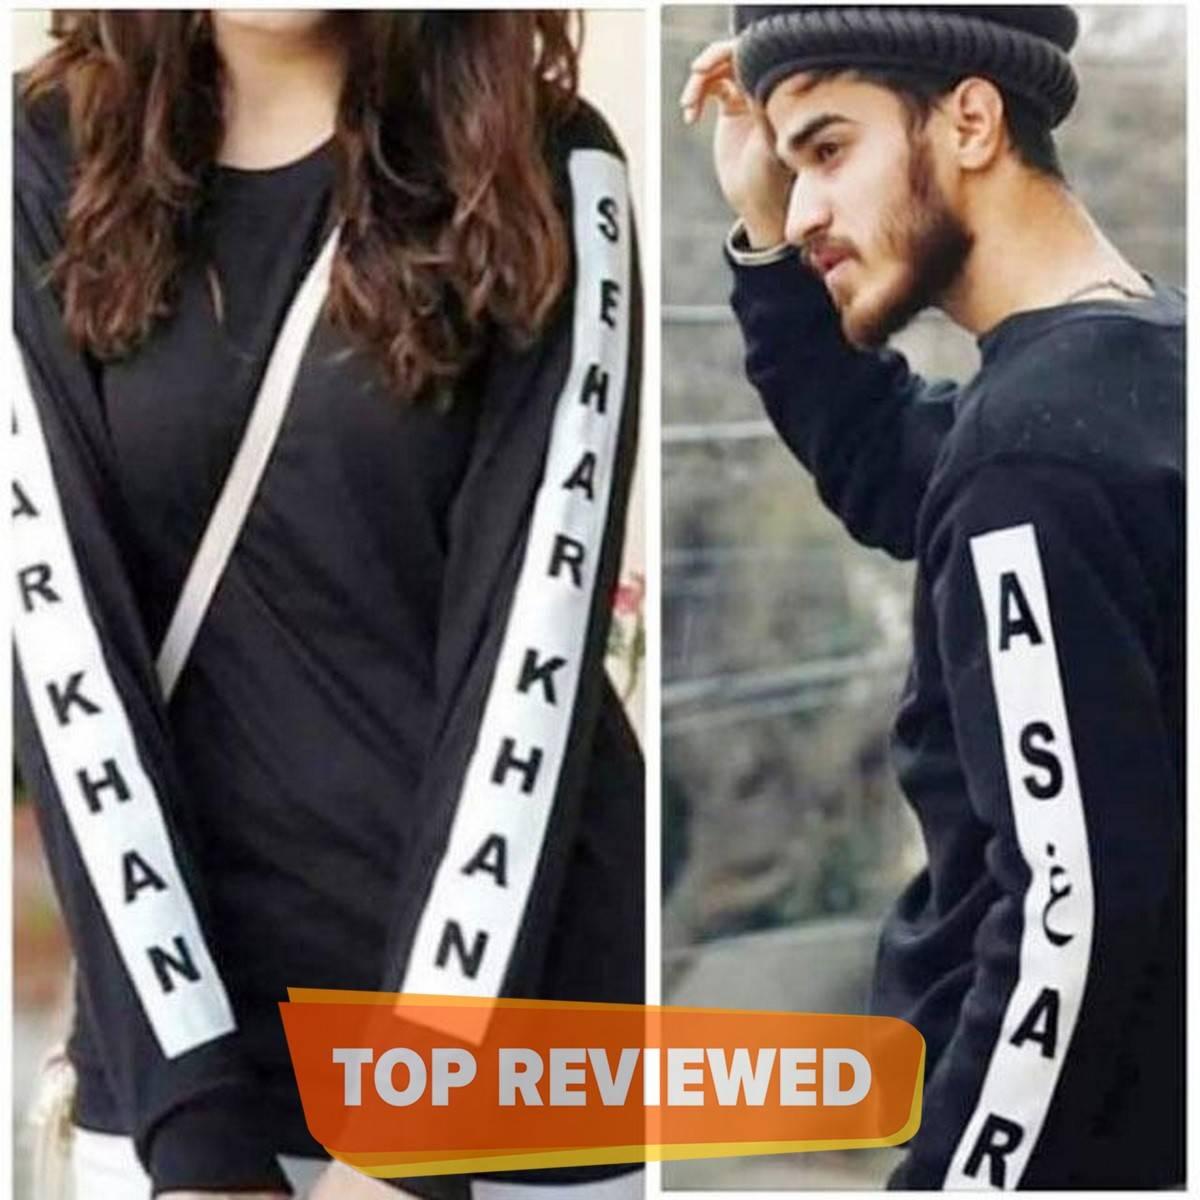 Customized Name Full Sleeves Shirt on Both Sleeves